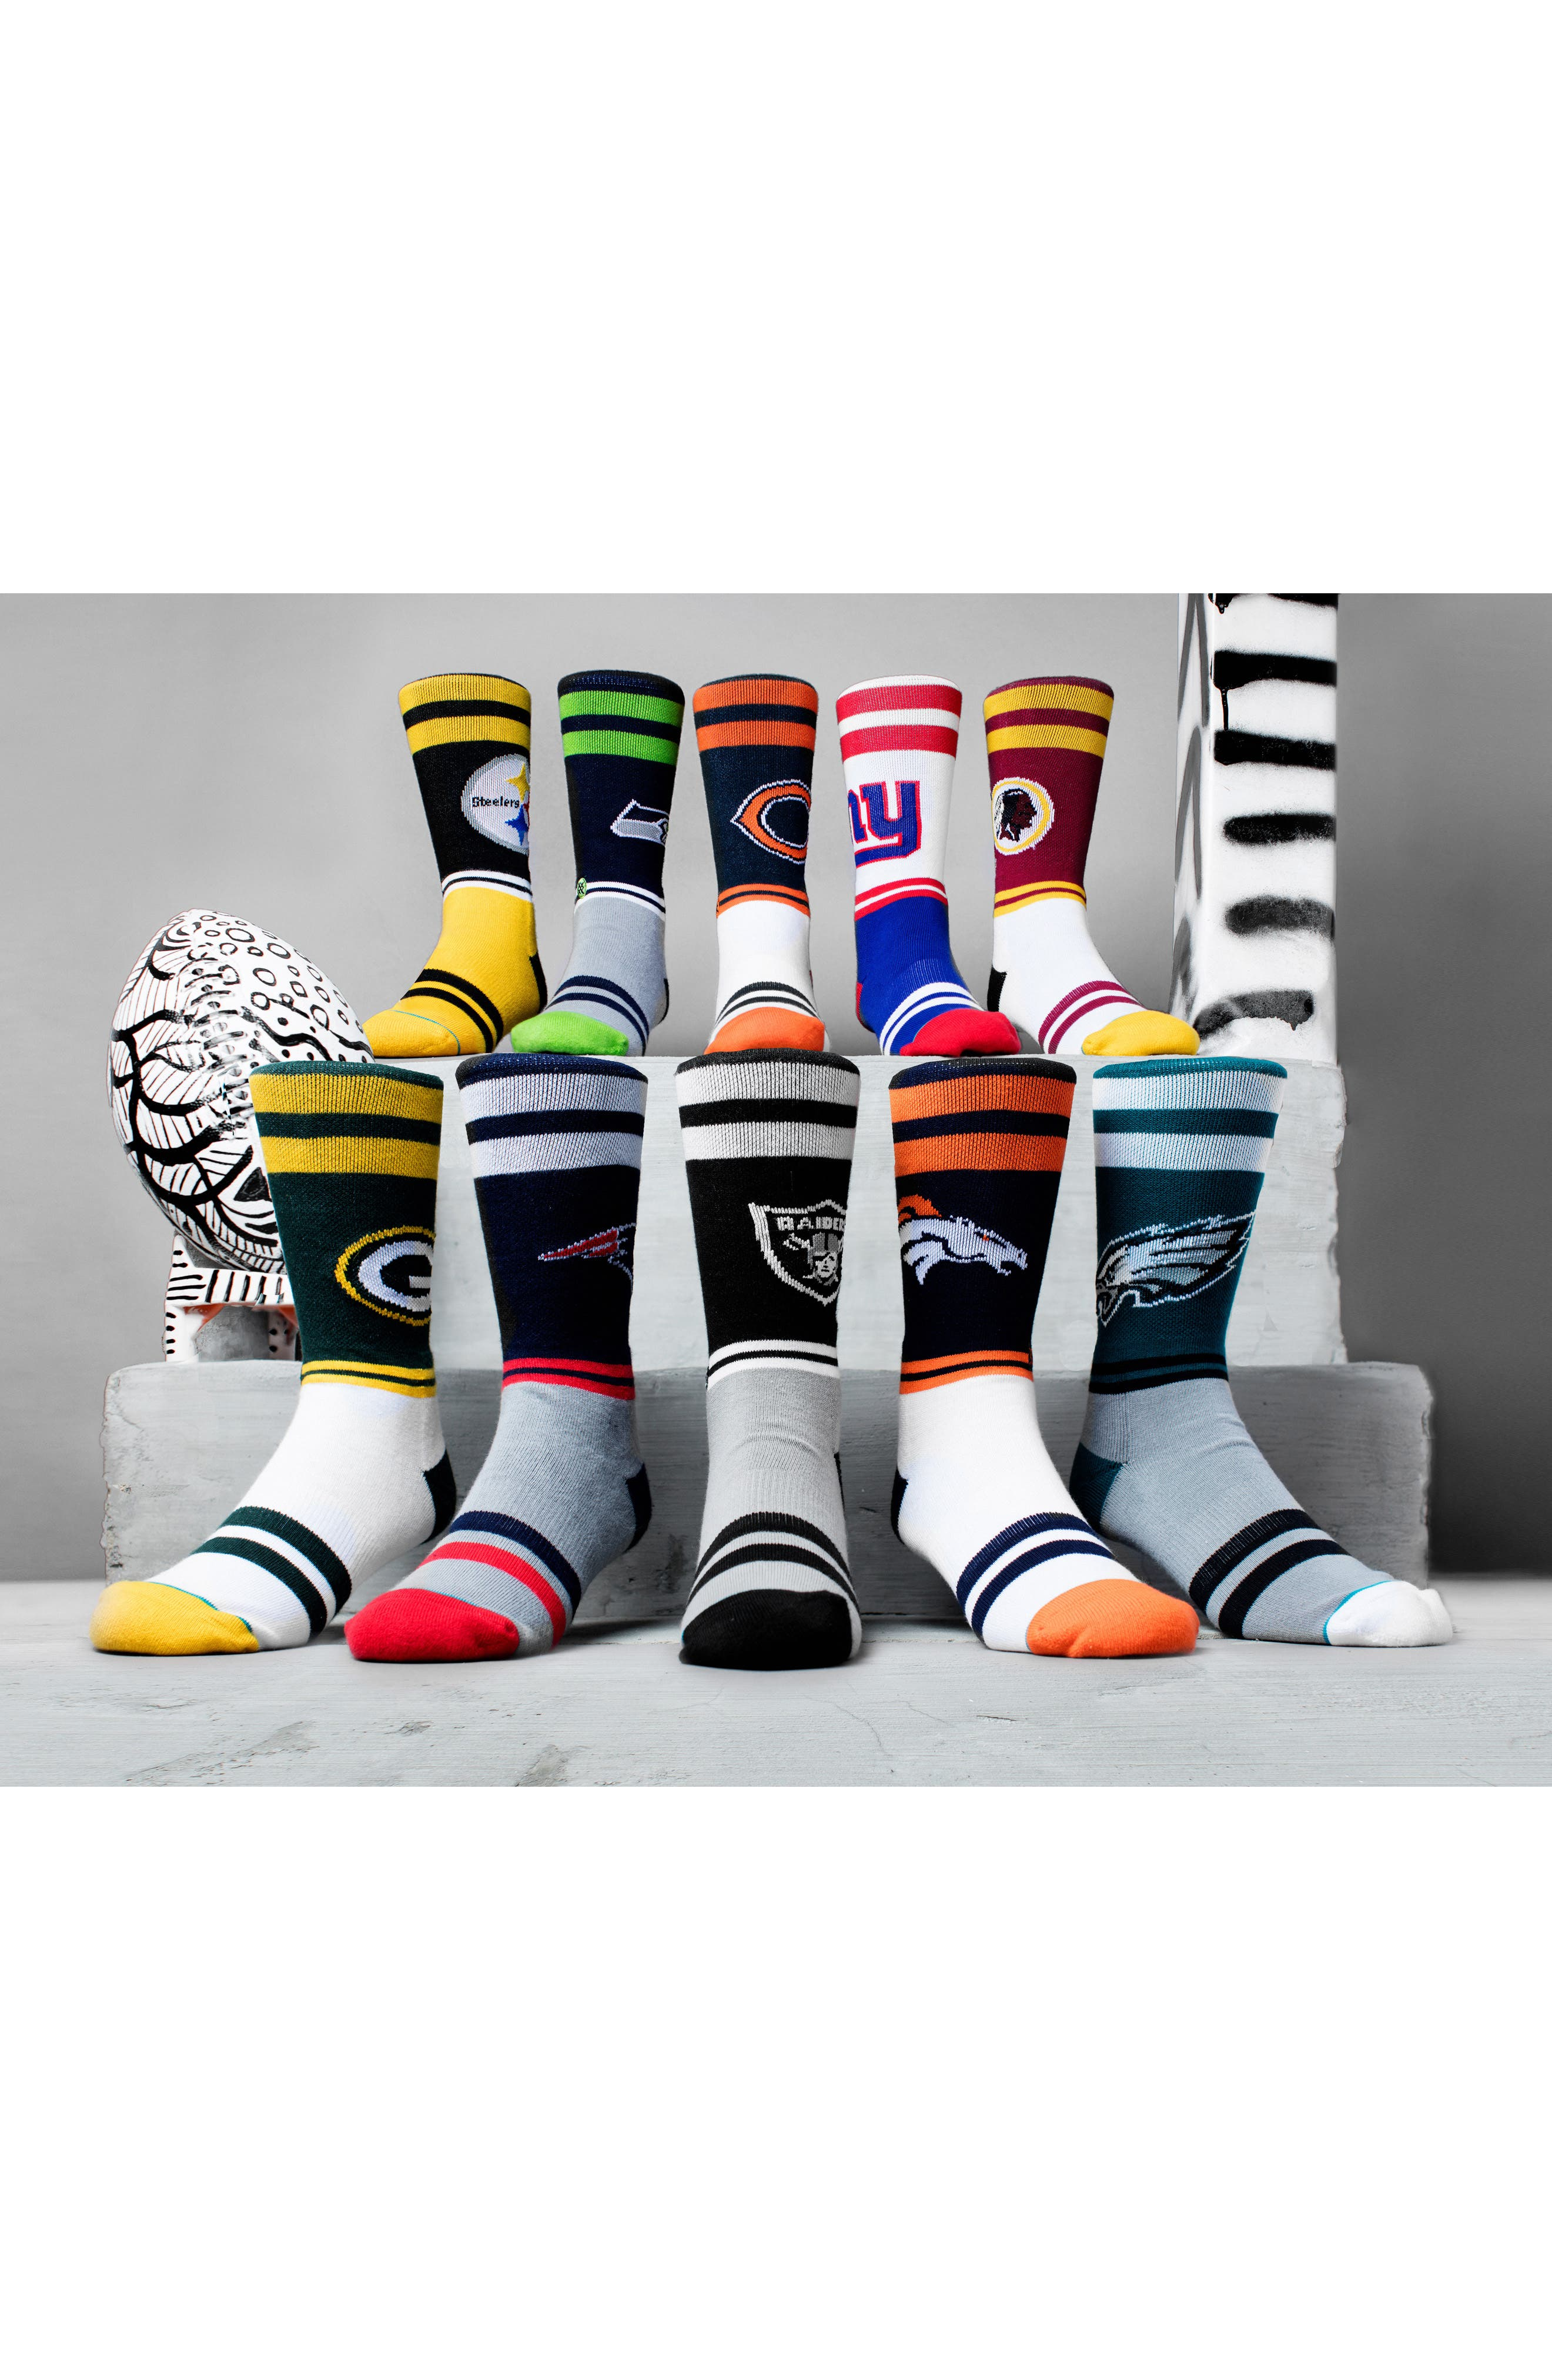 Oakland Raiders Sideline Socks,                             Alternate thumbnail 4, color,                             001